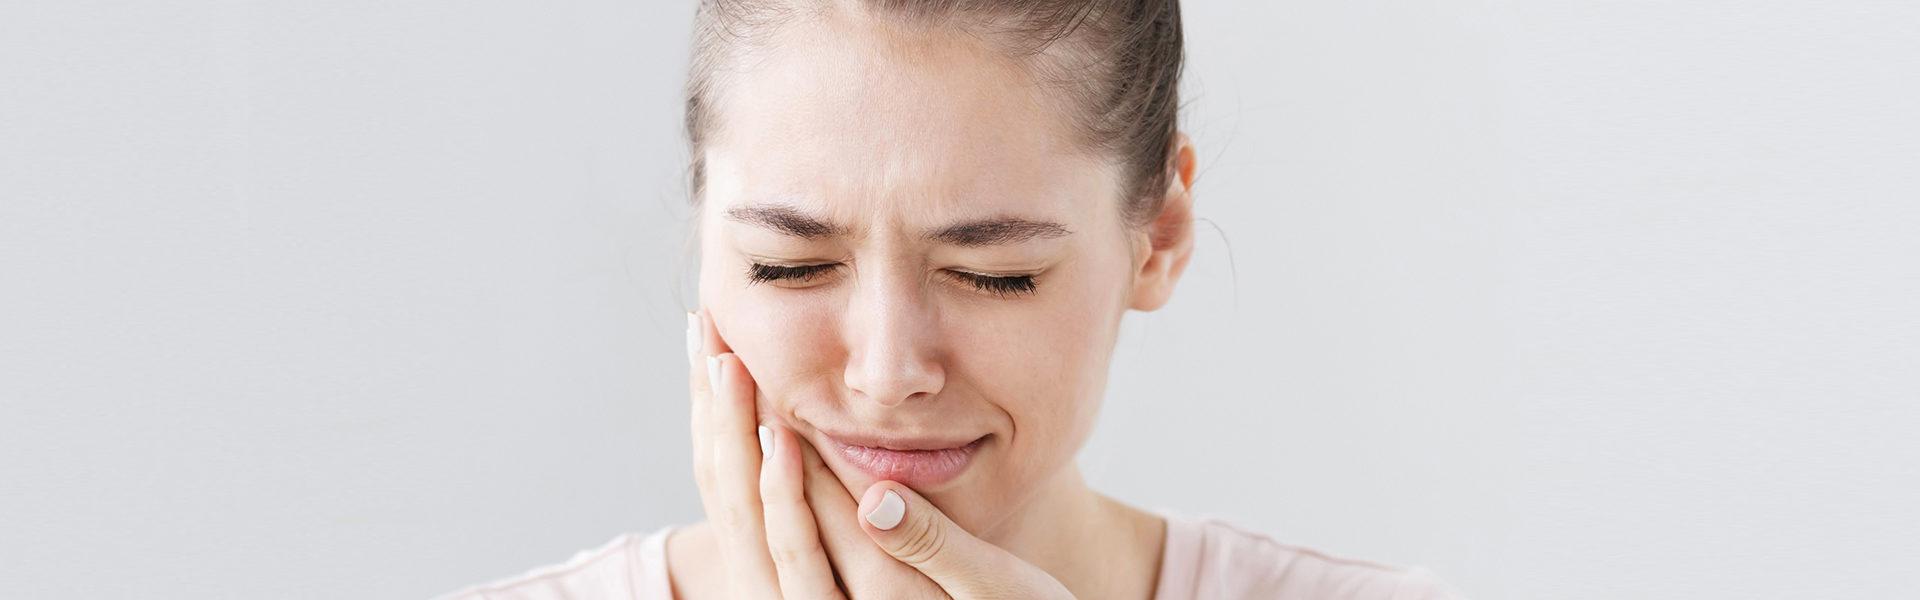 Dental Emergencies in Cupertino, CA